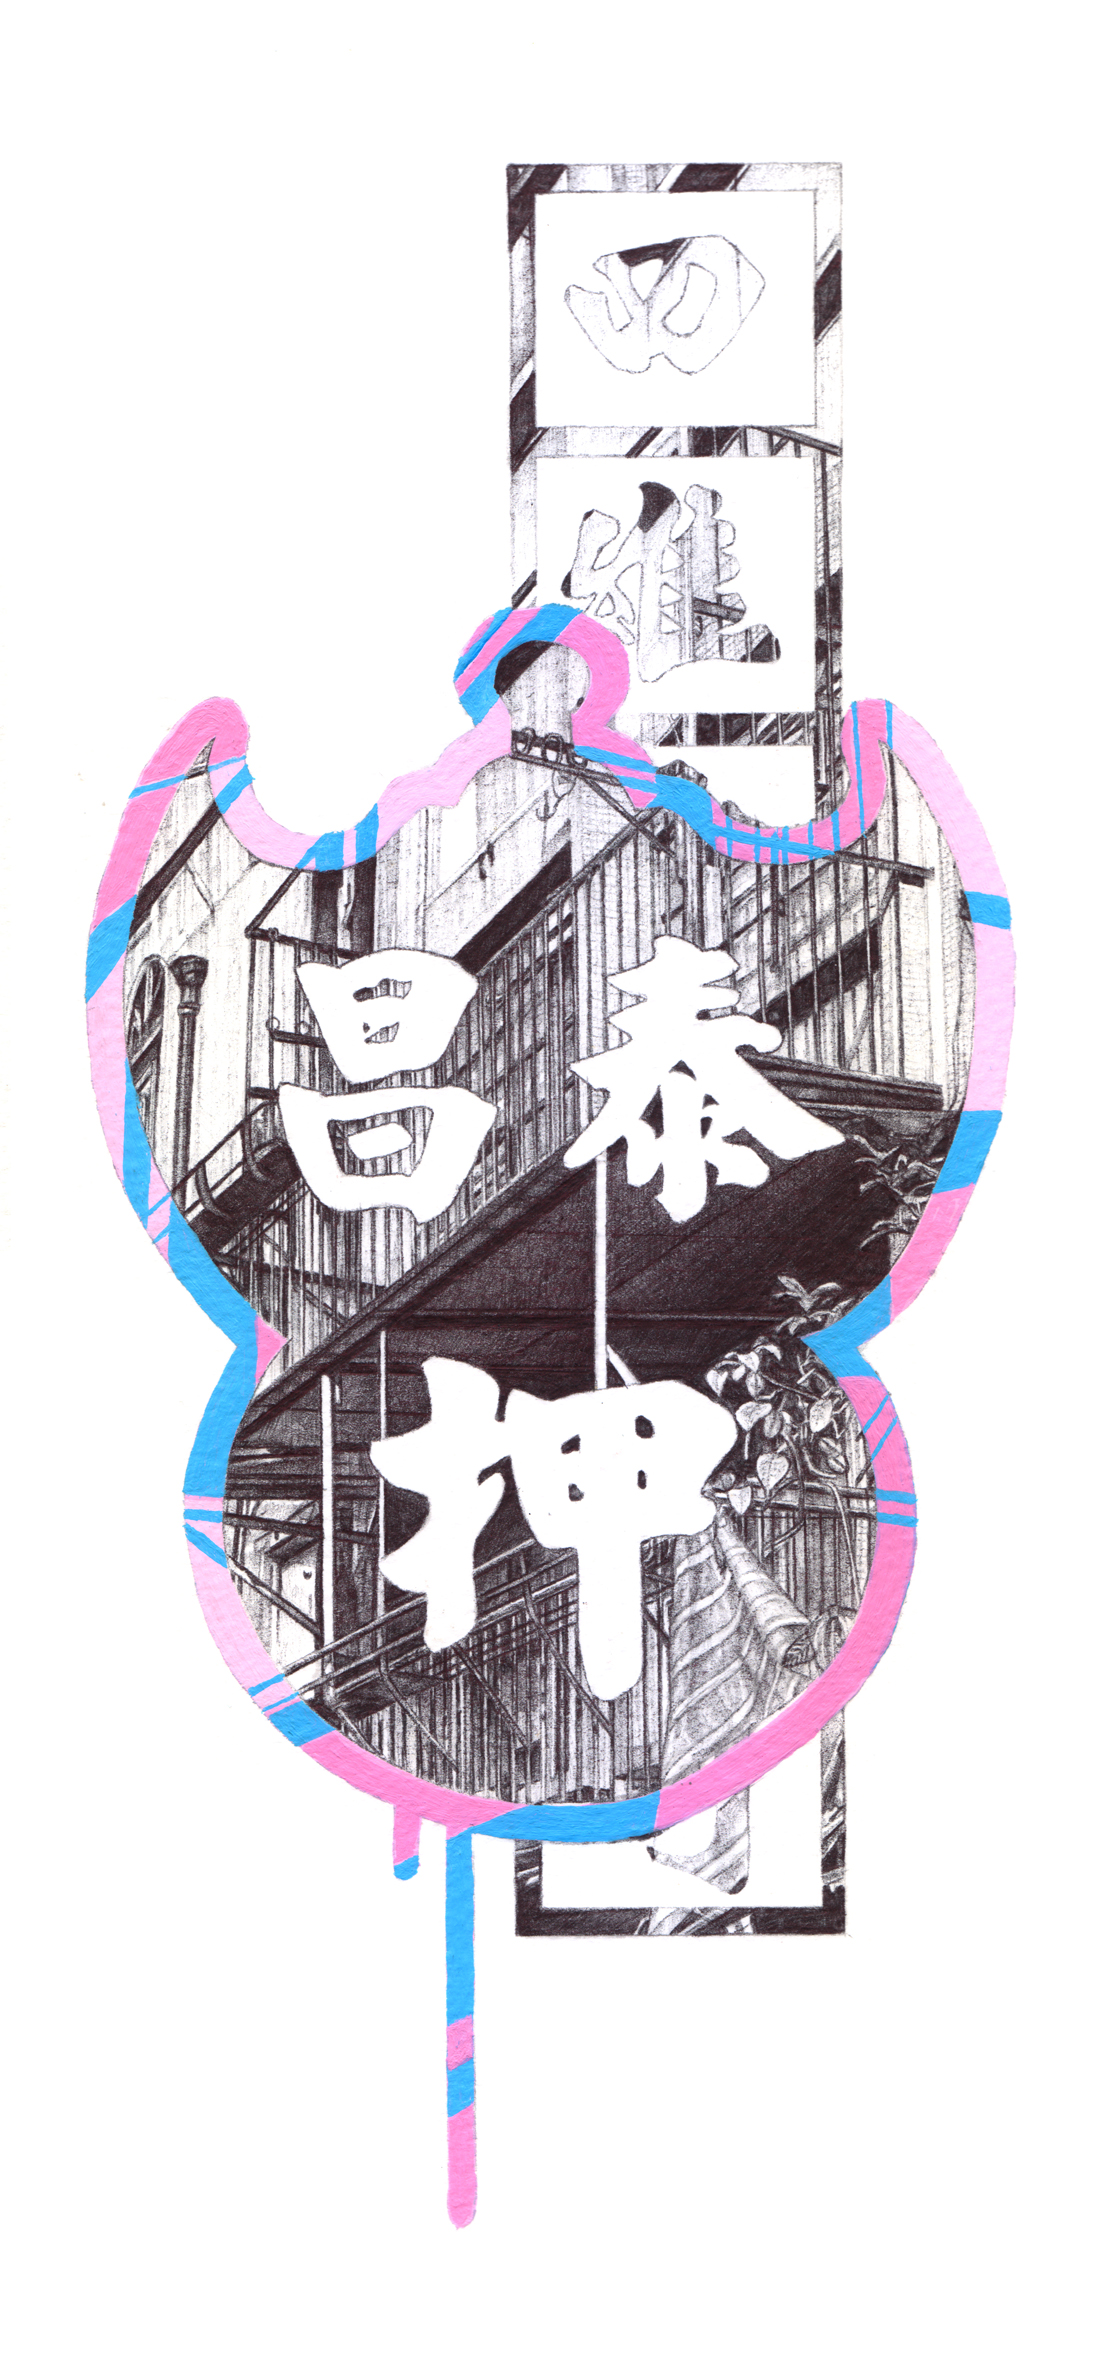 Pete Ross Art | Signs of Change (2)